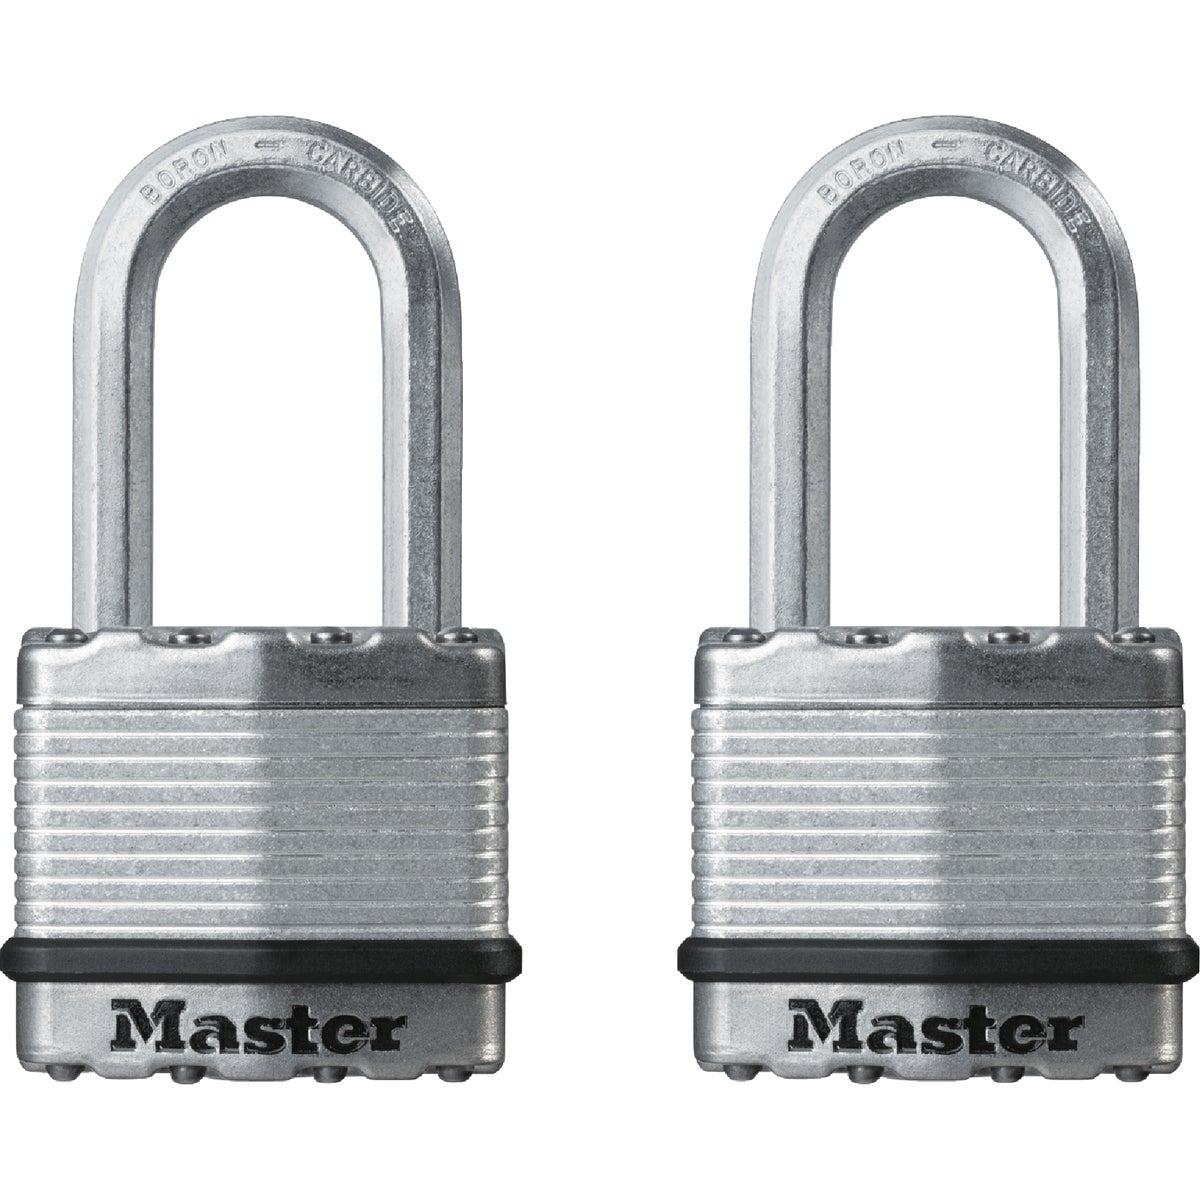 2PK 1-3/4 MAG LG PADLOCK - M1XTLF by Master Lock Company